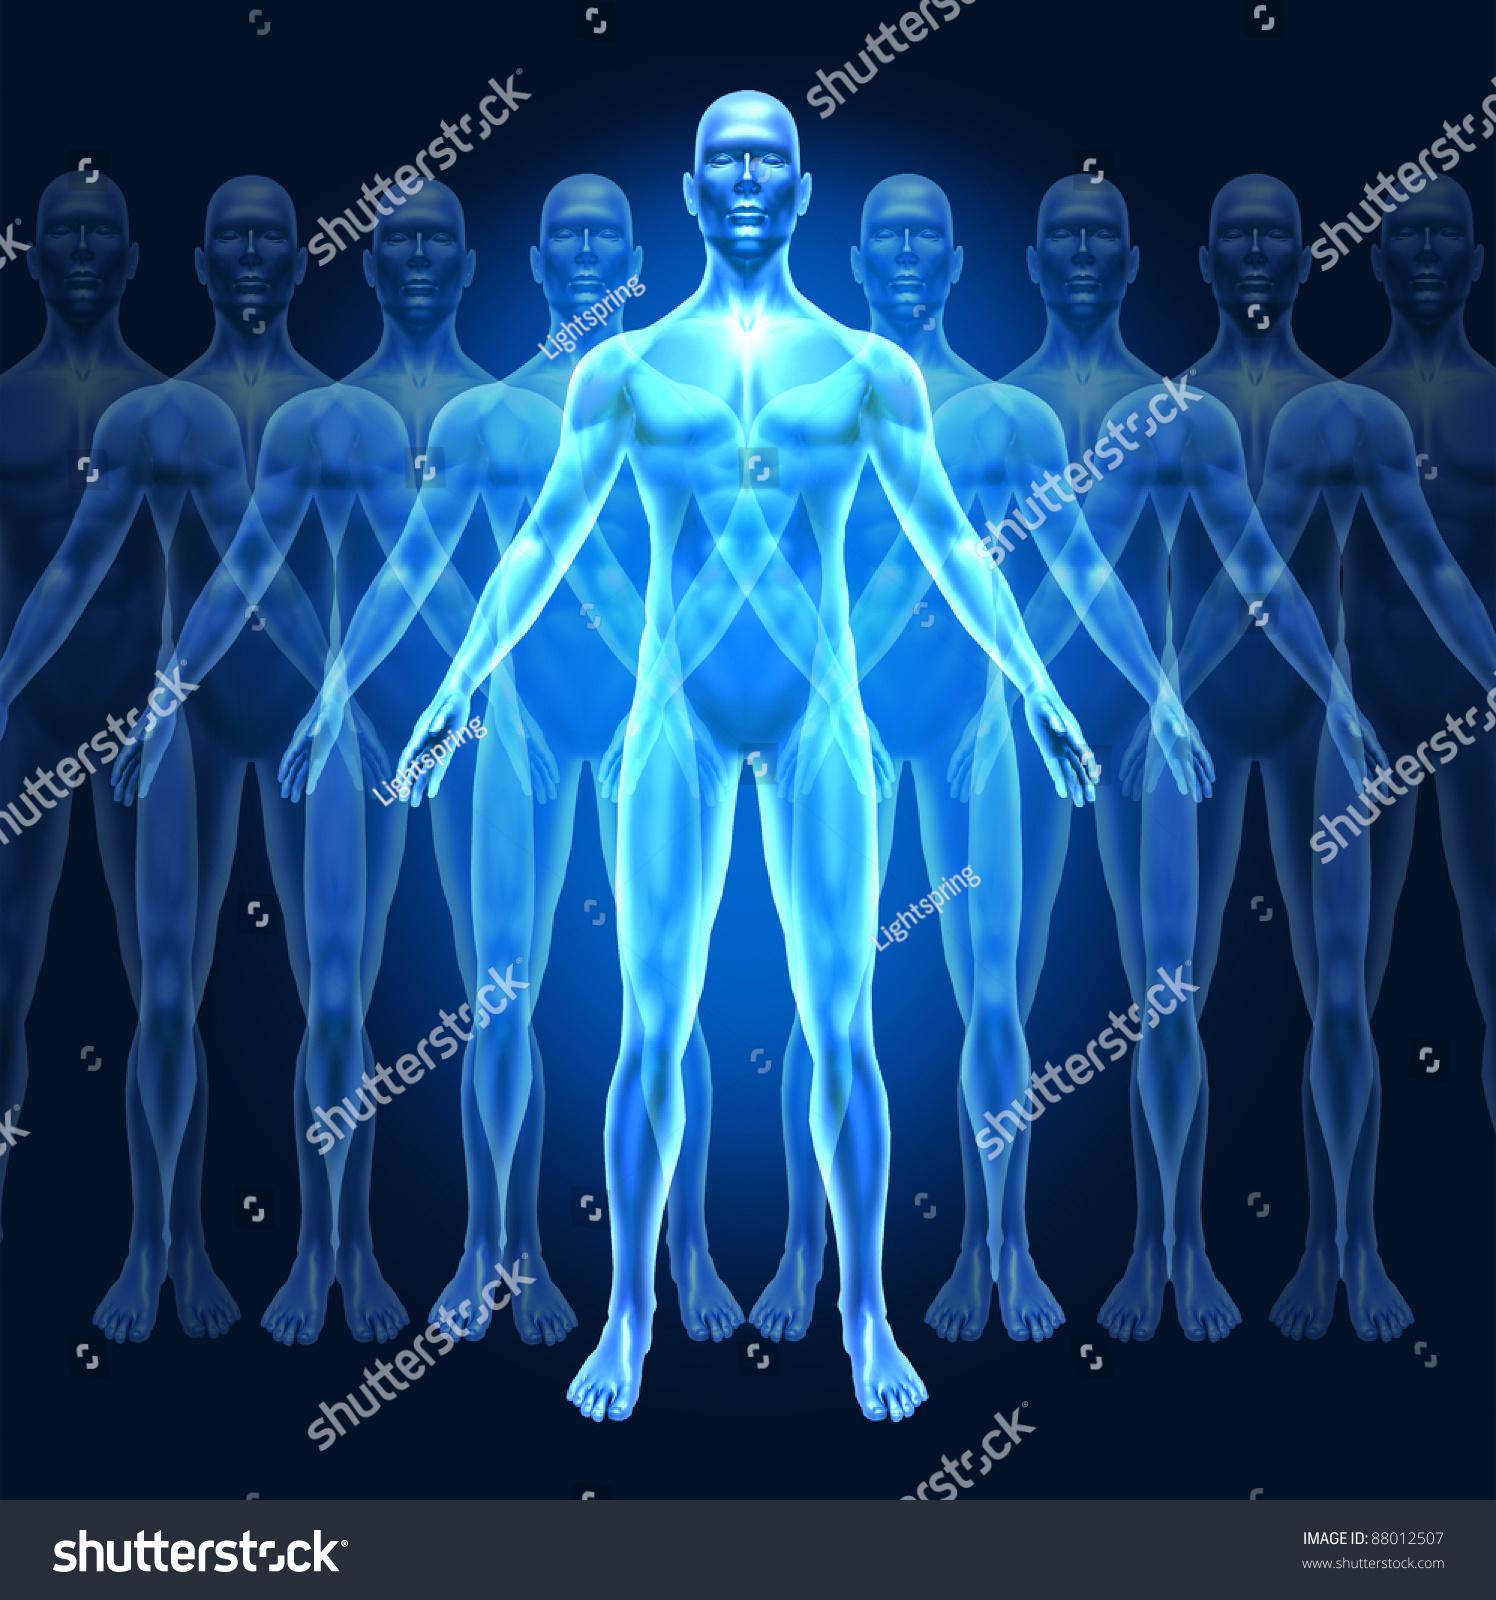 human growth development leadership symbol represented stock, Muscles